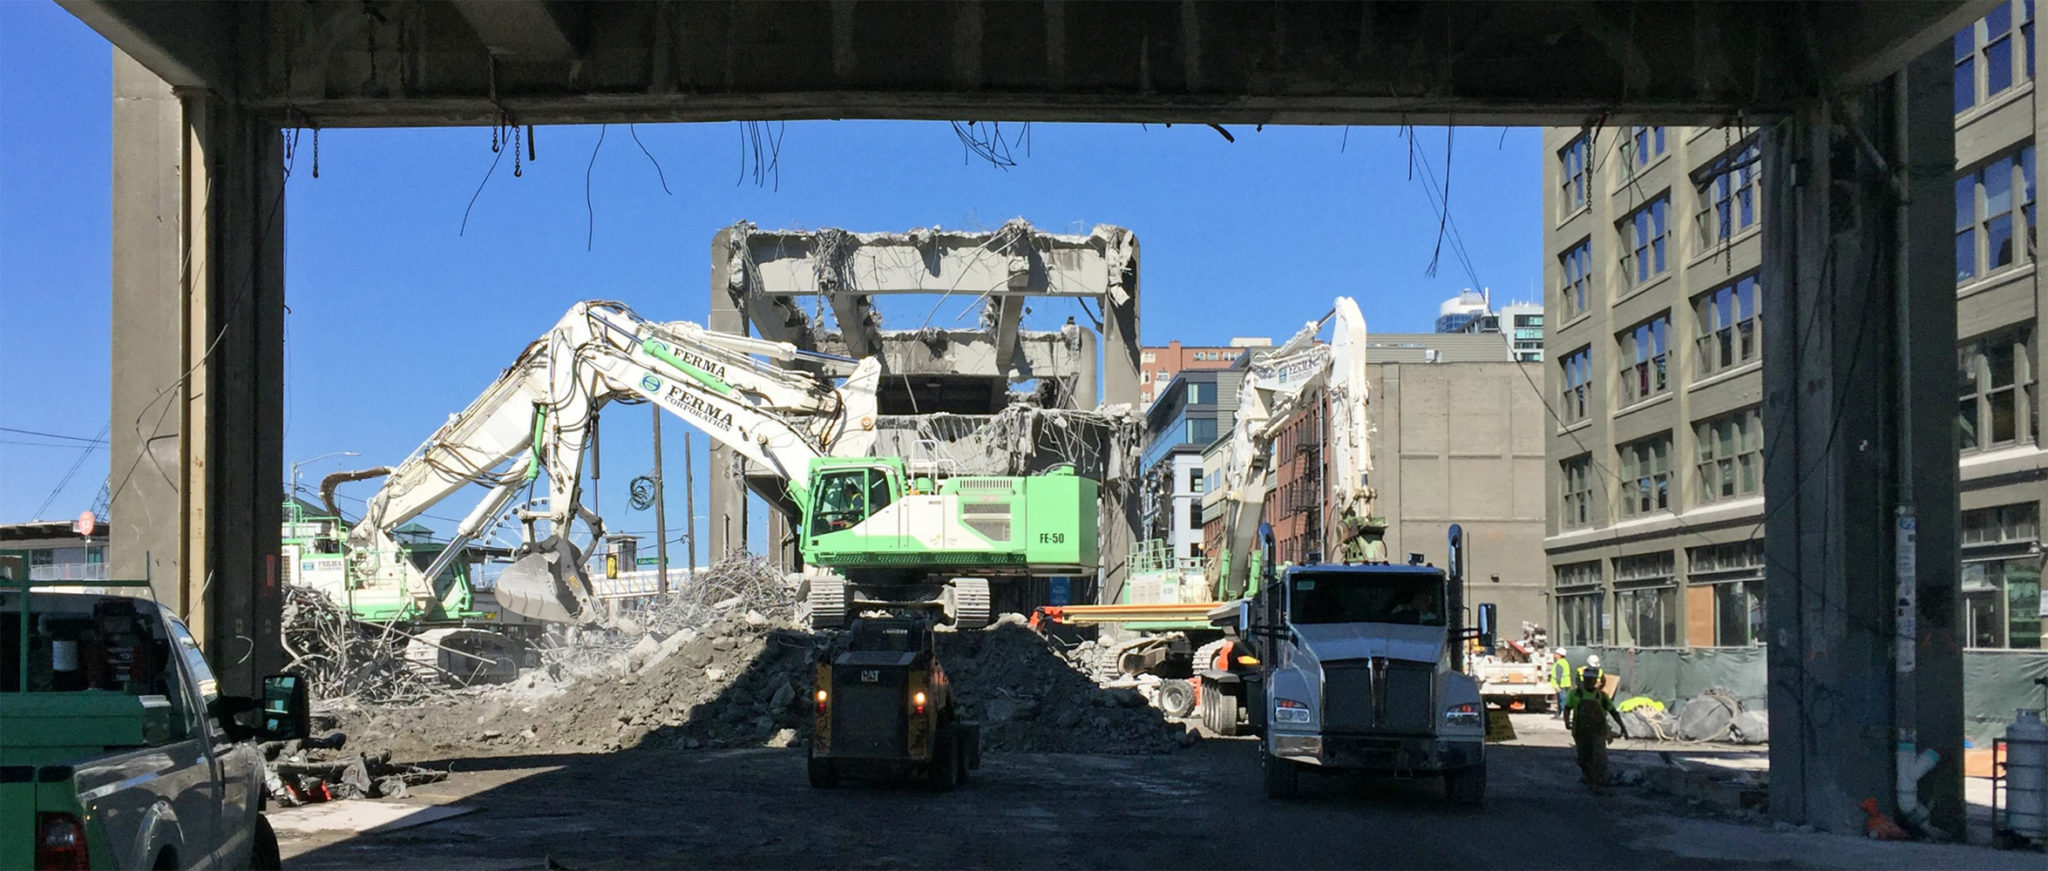 picture of Alaskan Way Viaduct Demolition